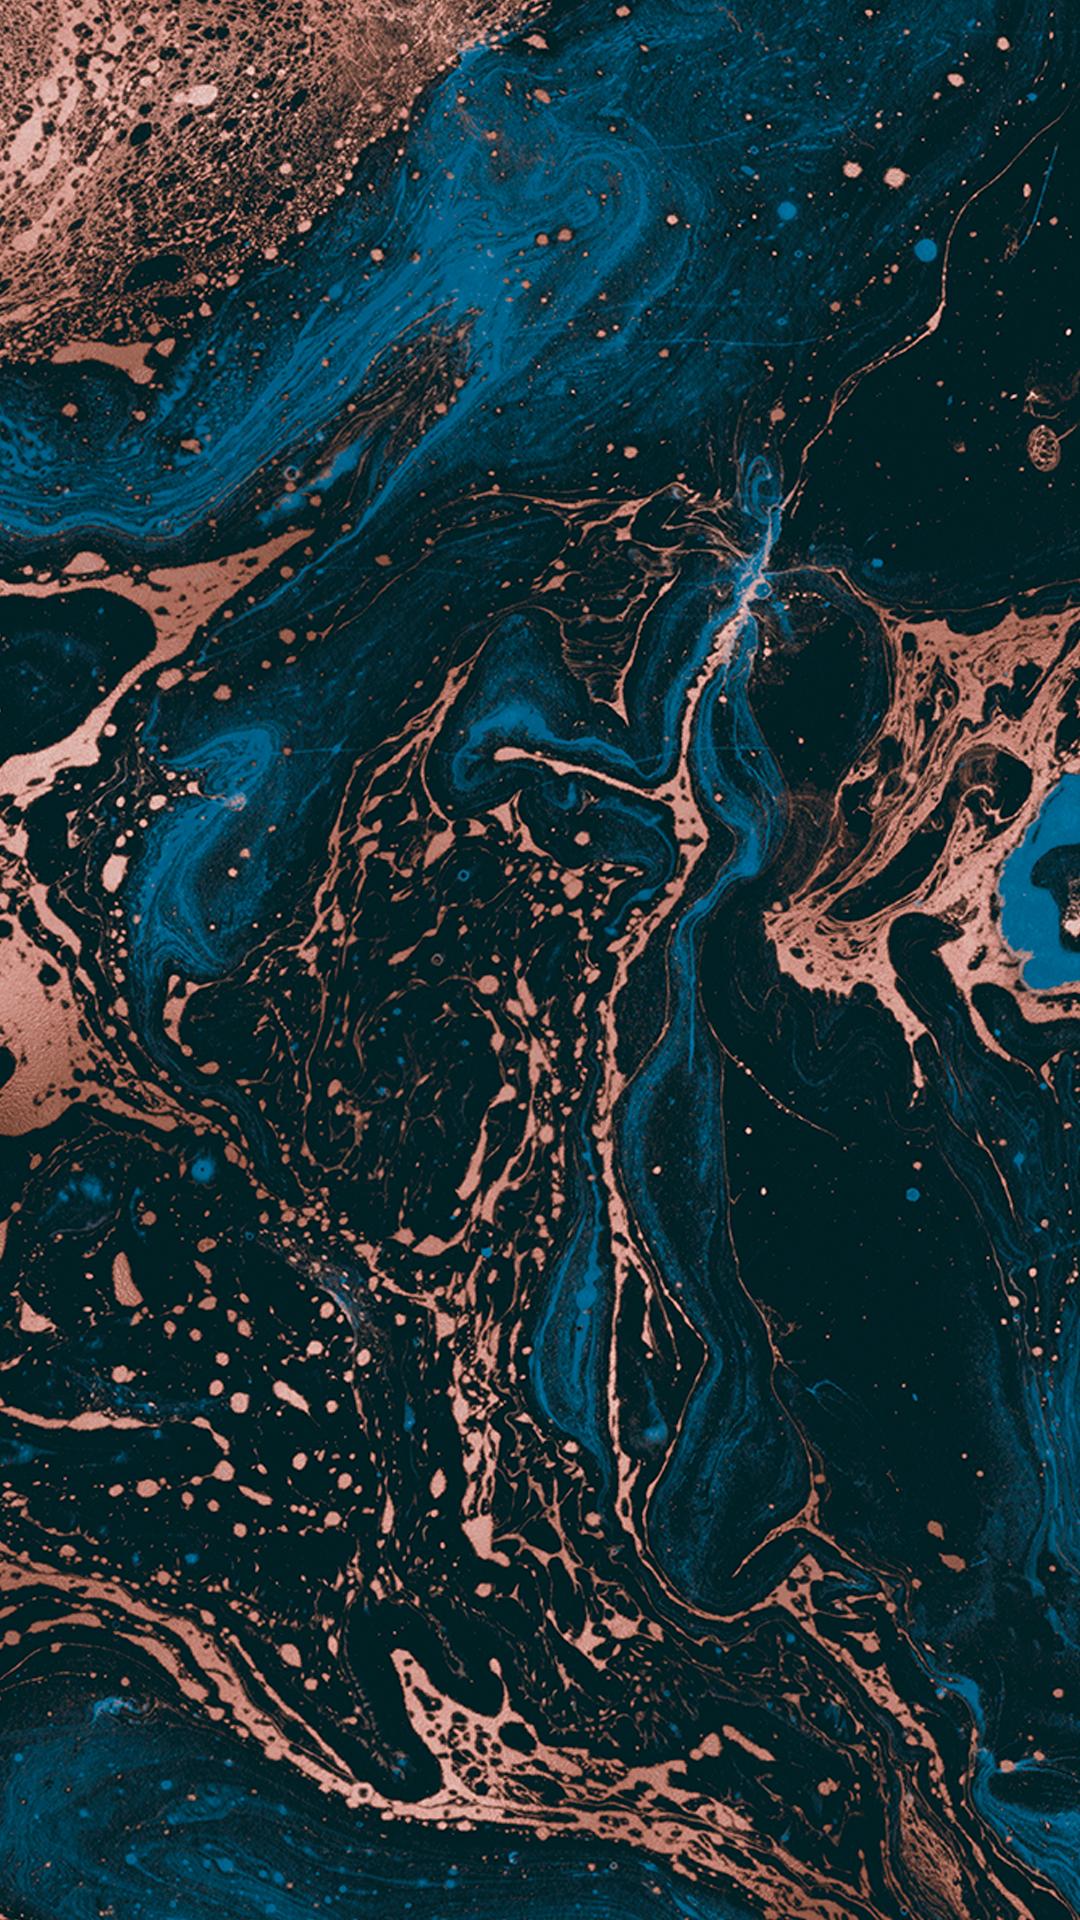 Wallpaper Prime - Dark Blue Marble by Gocase